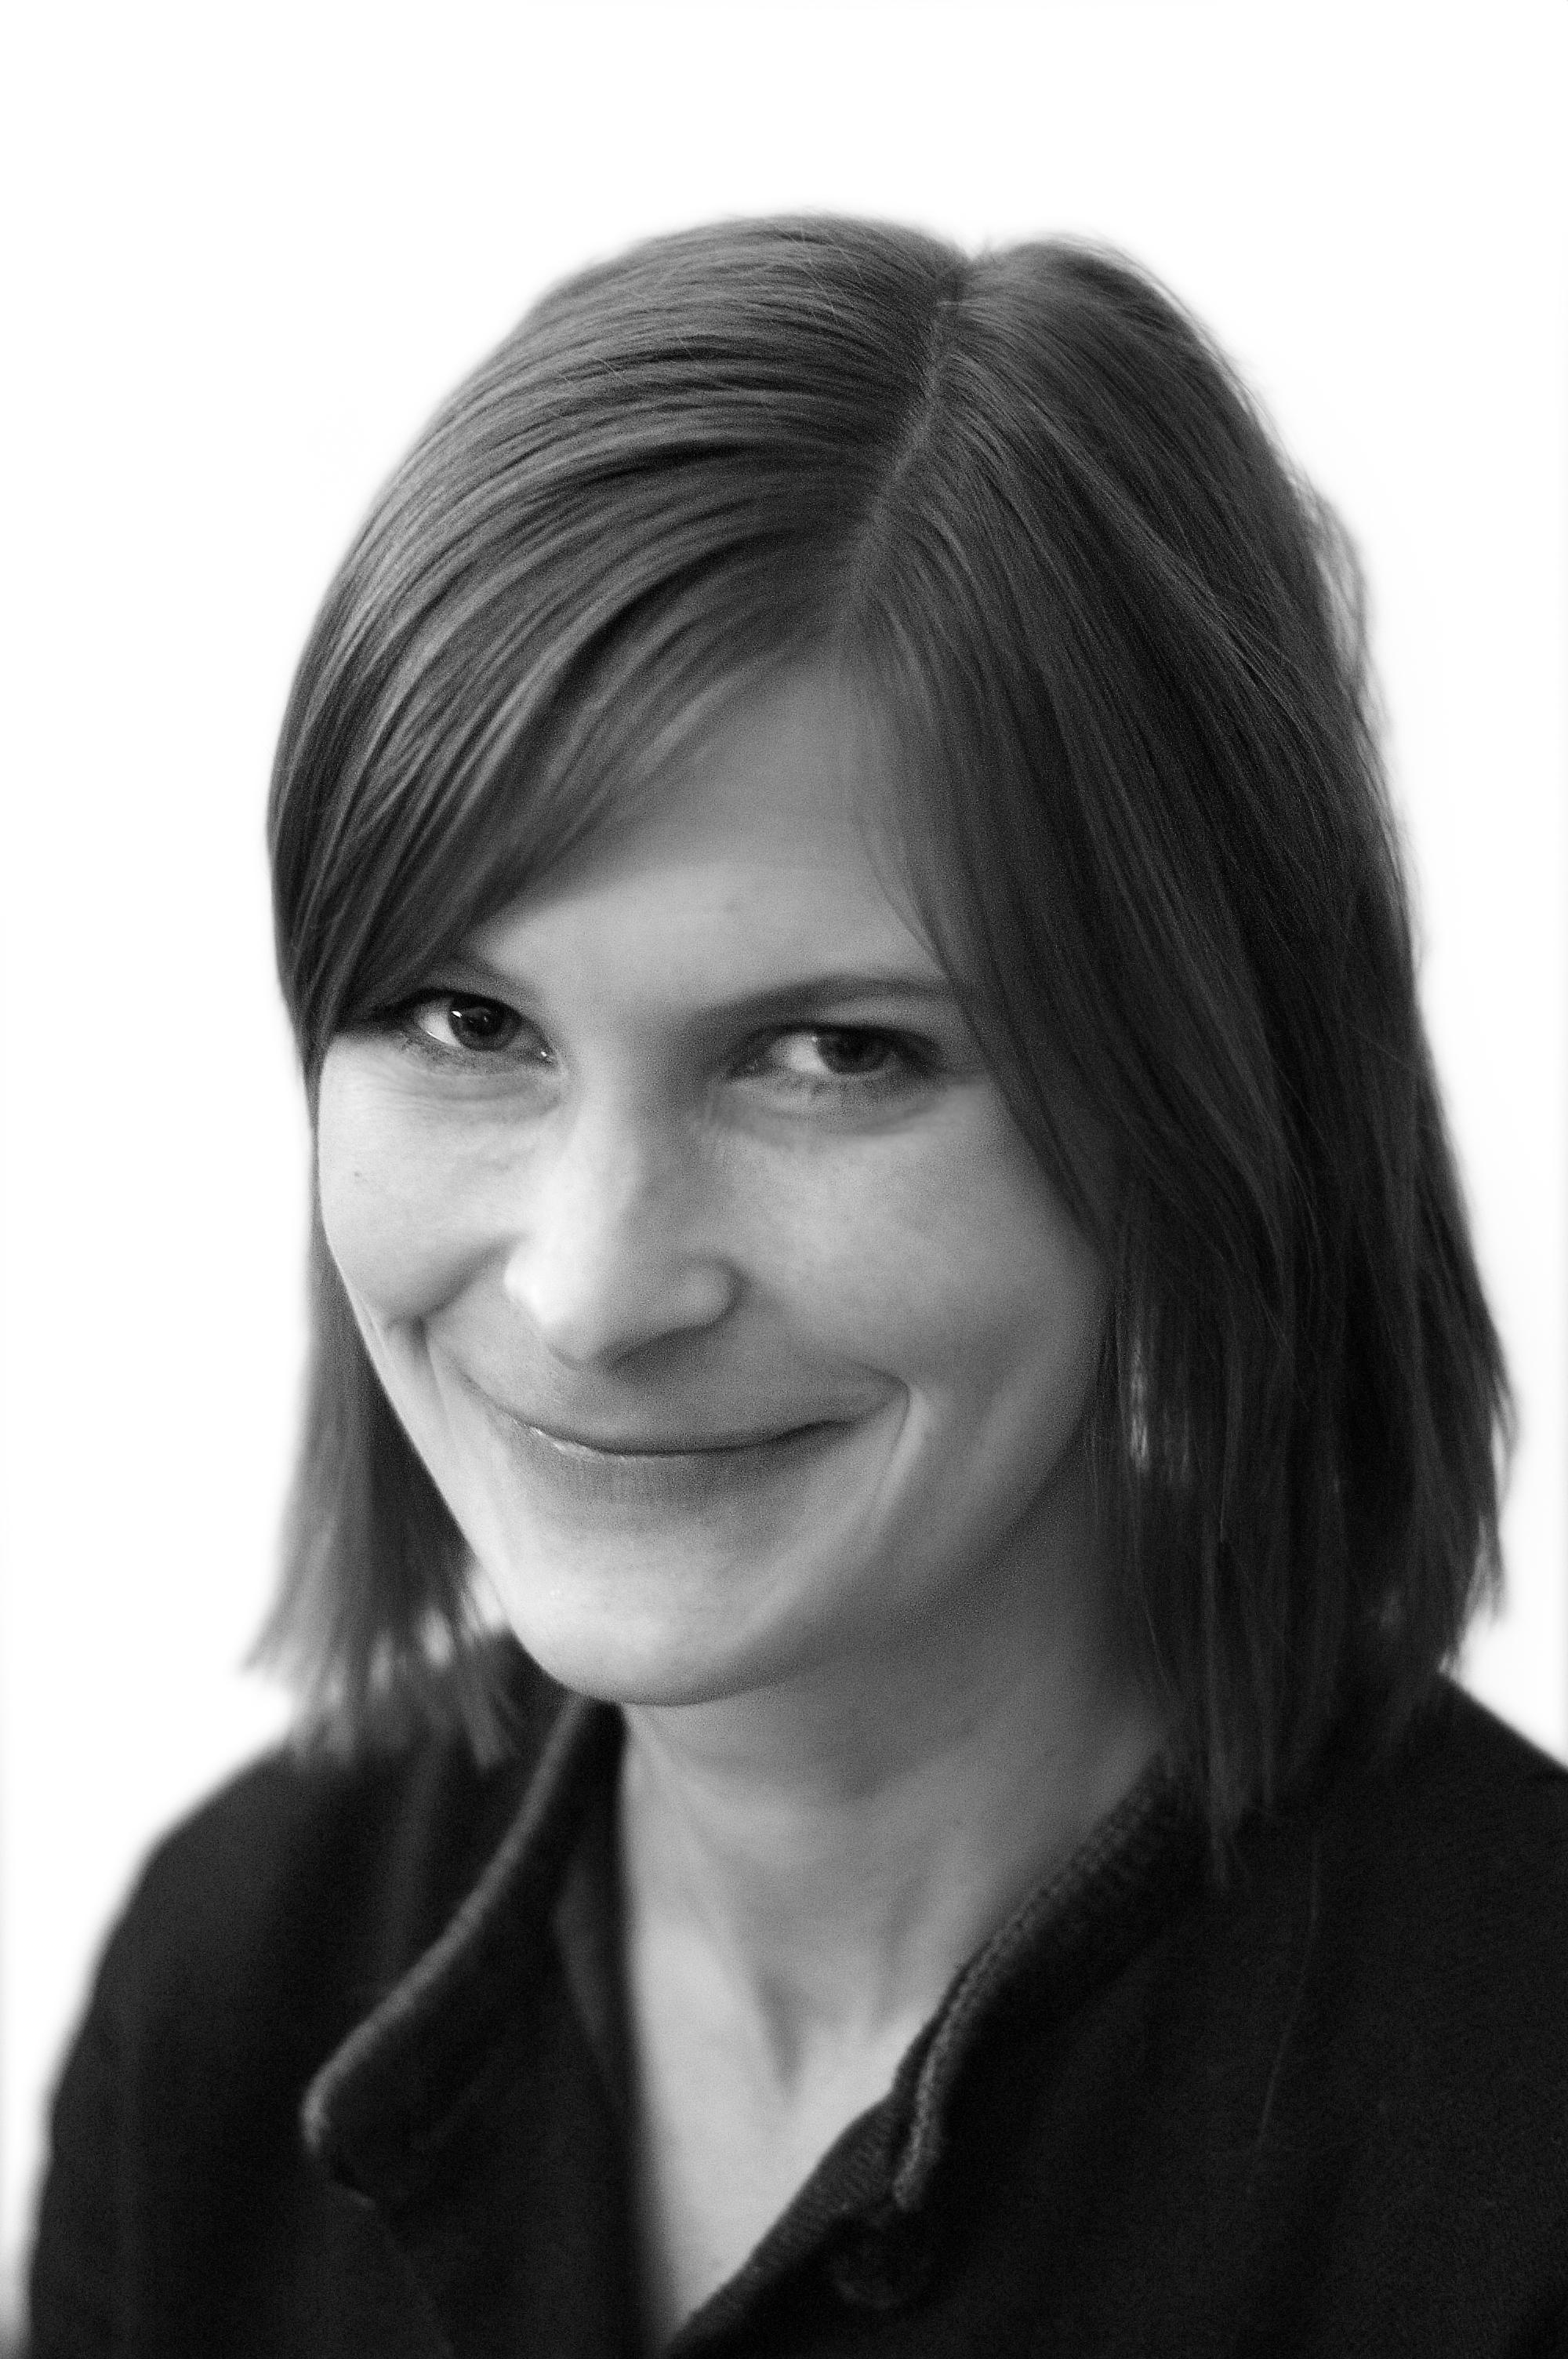 Heidi Kozak